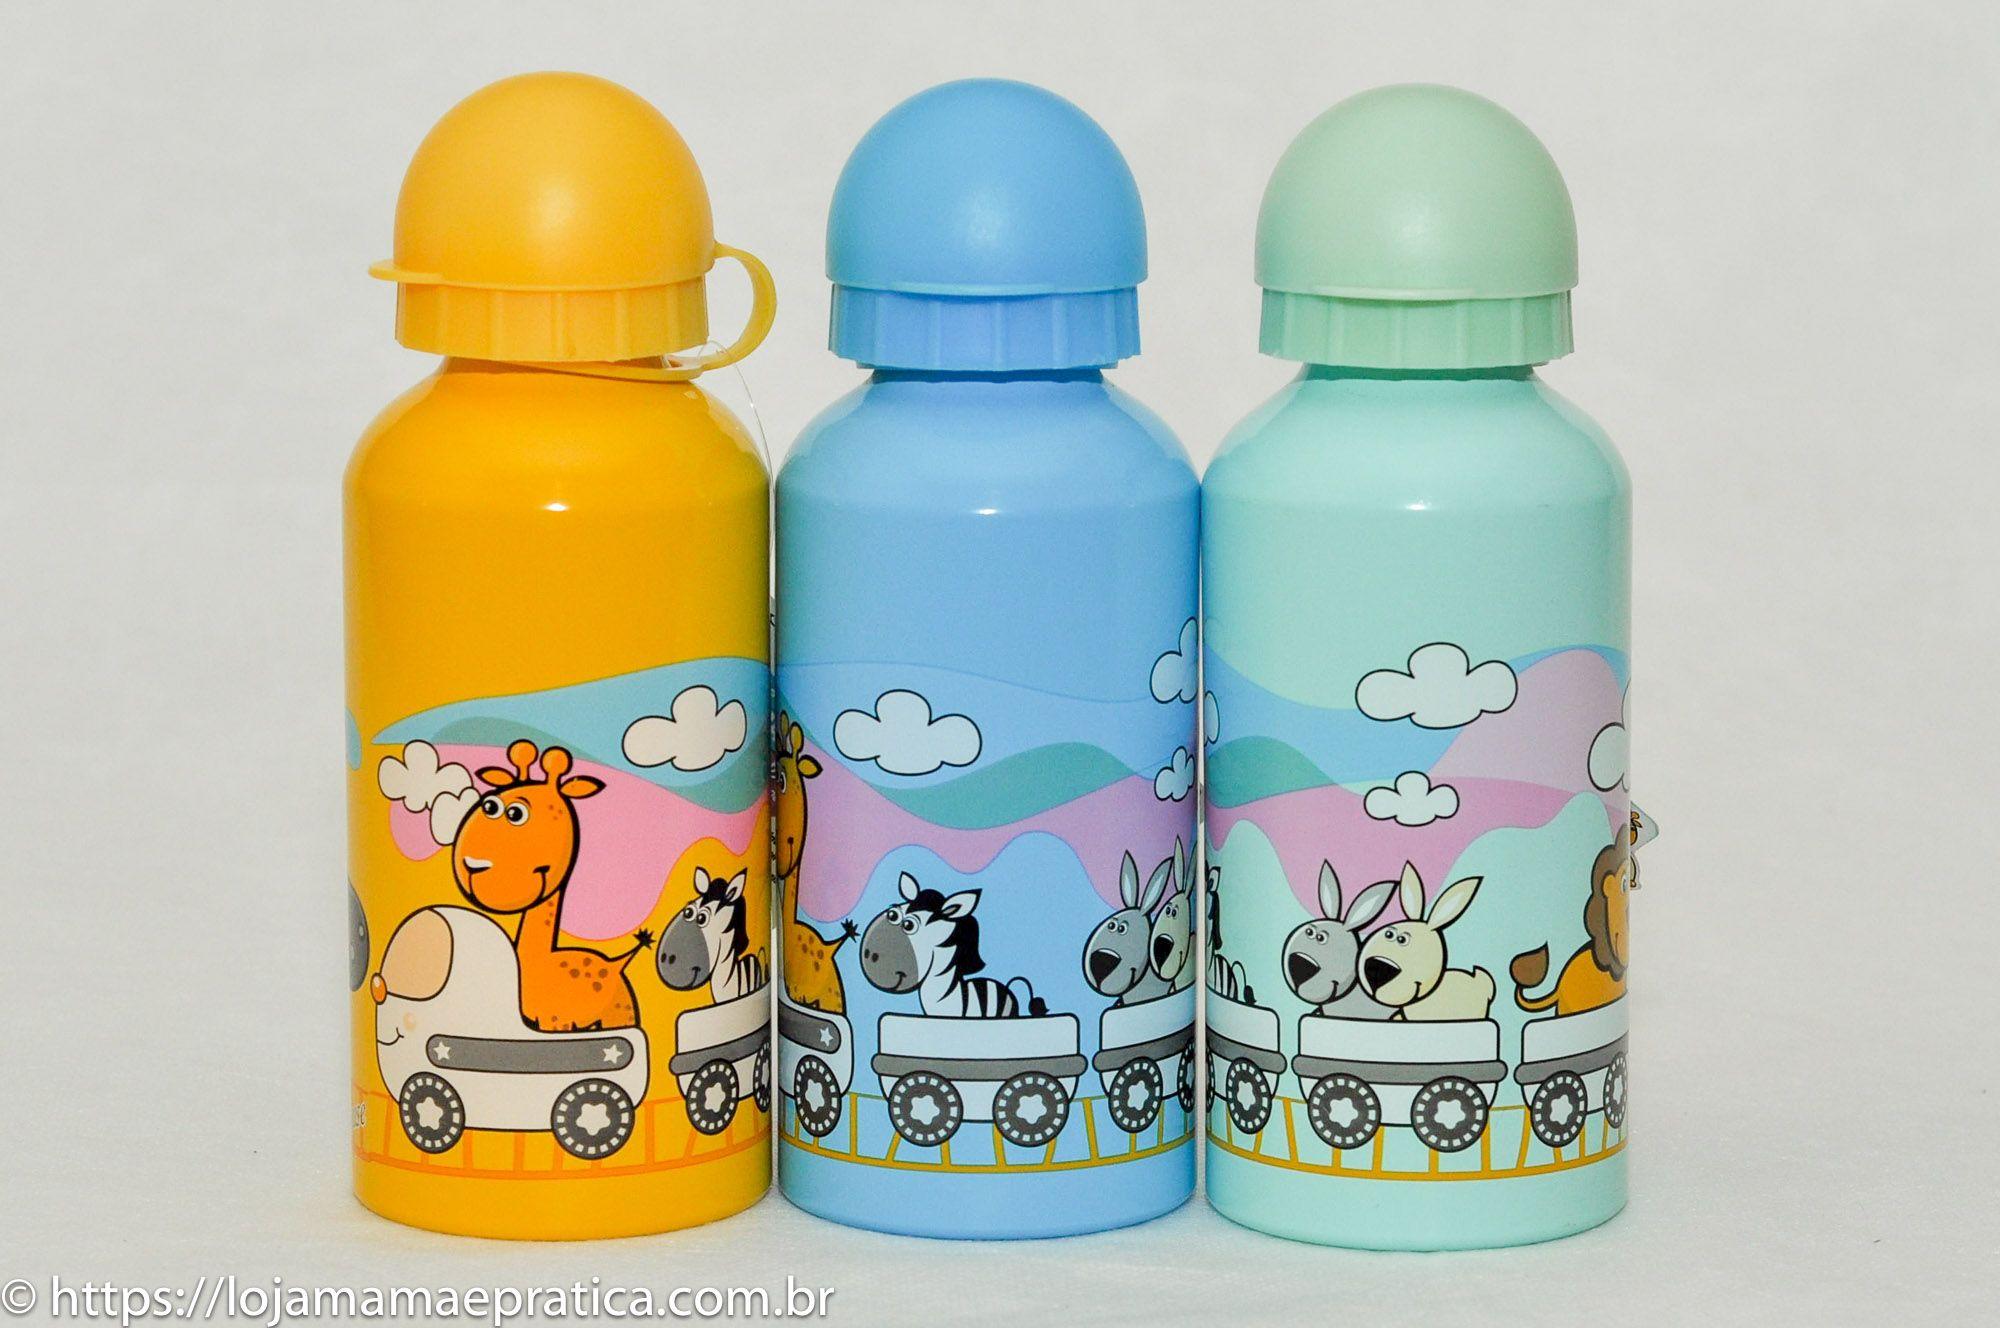 Squeeze bichinhos - 400 ml